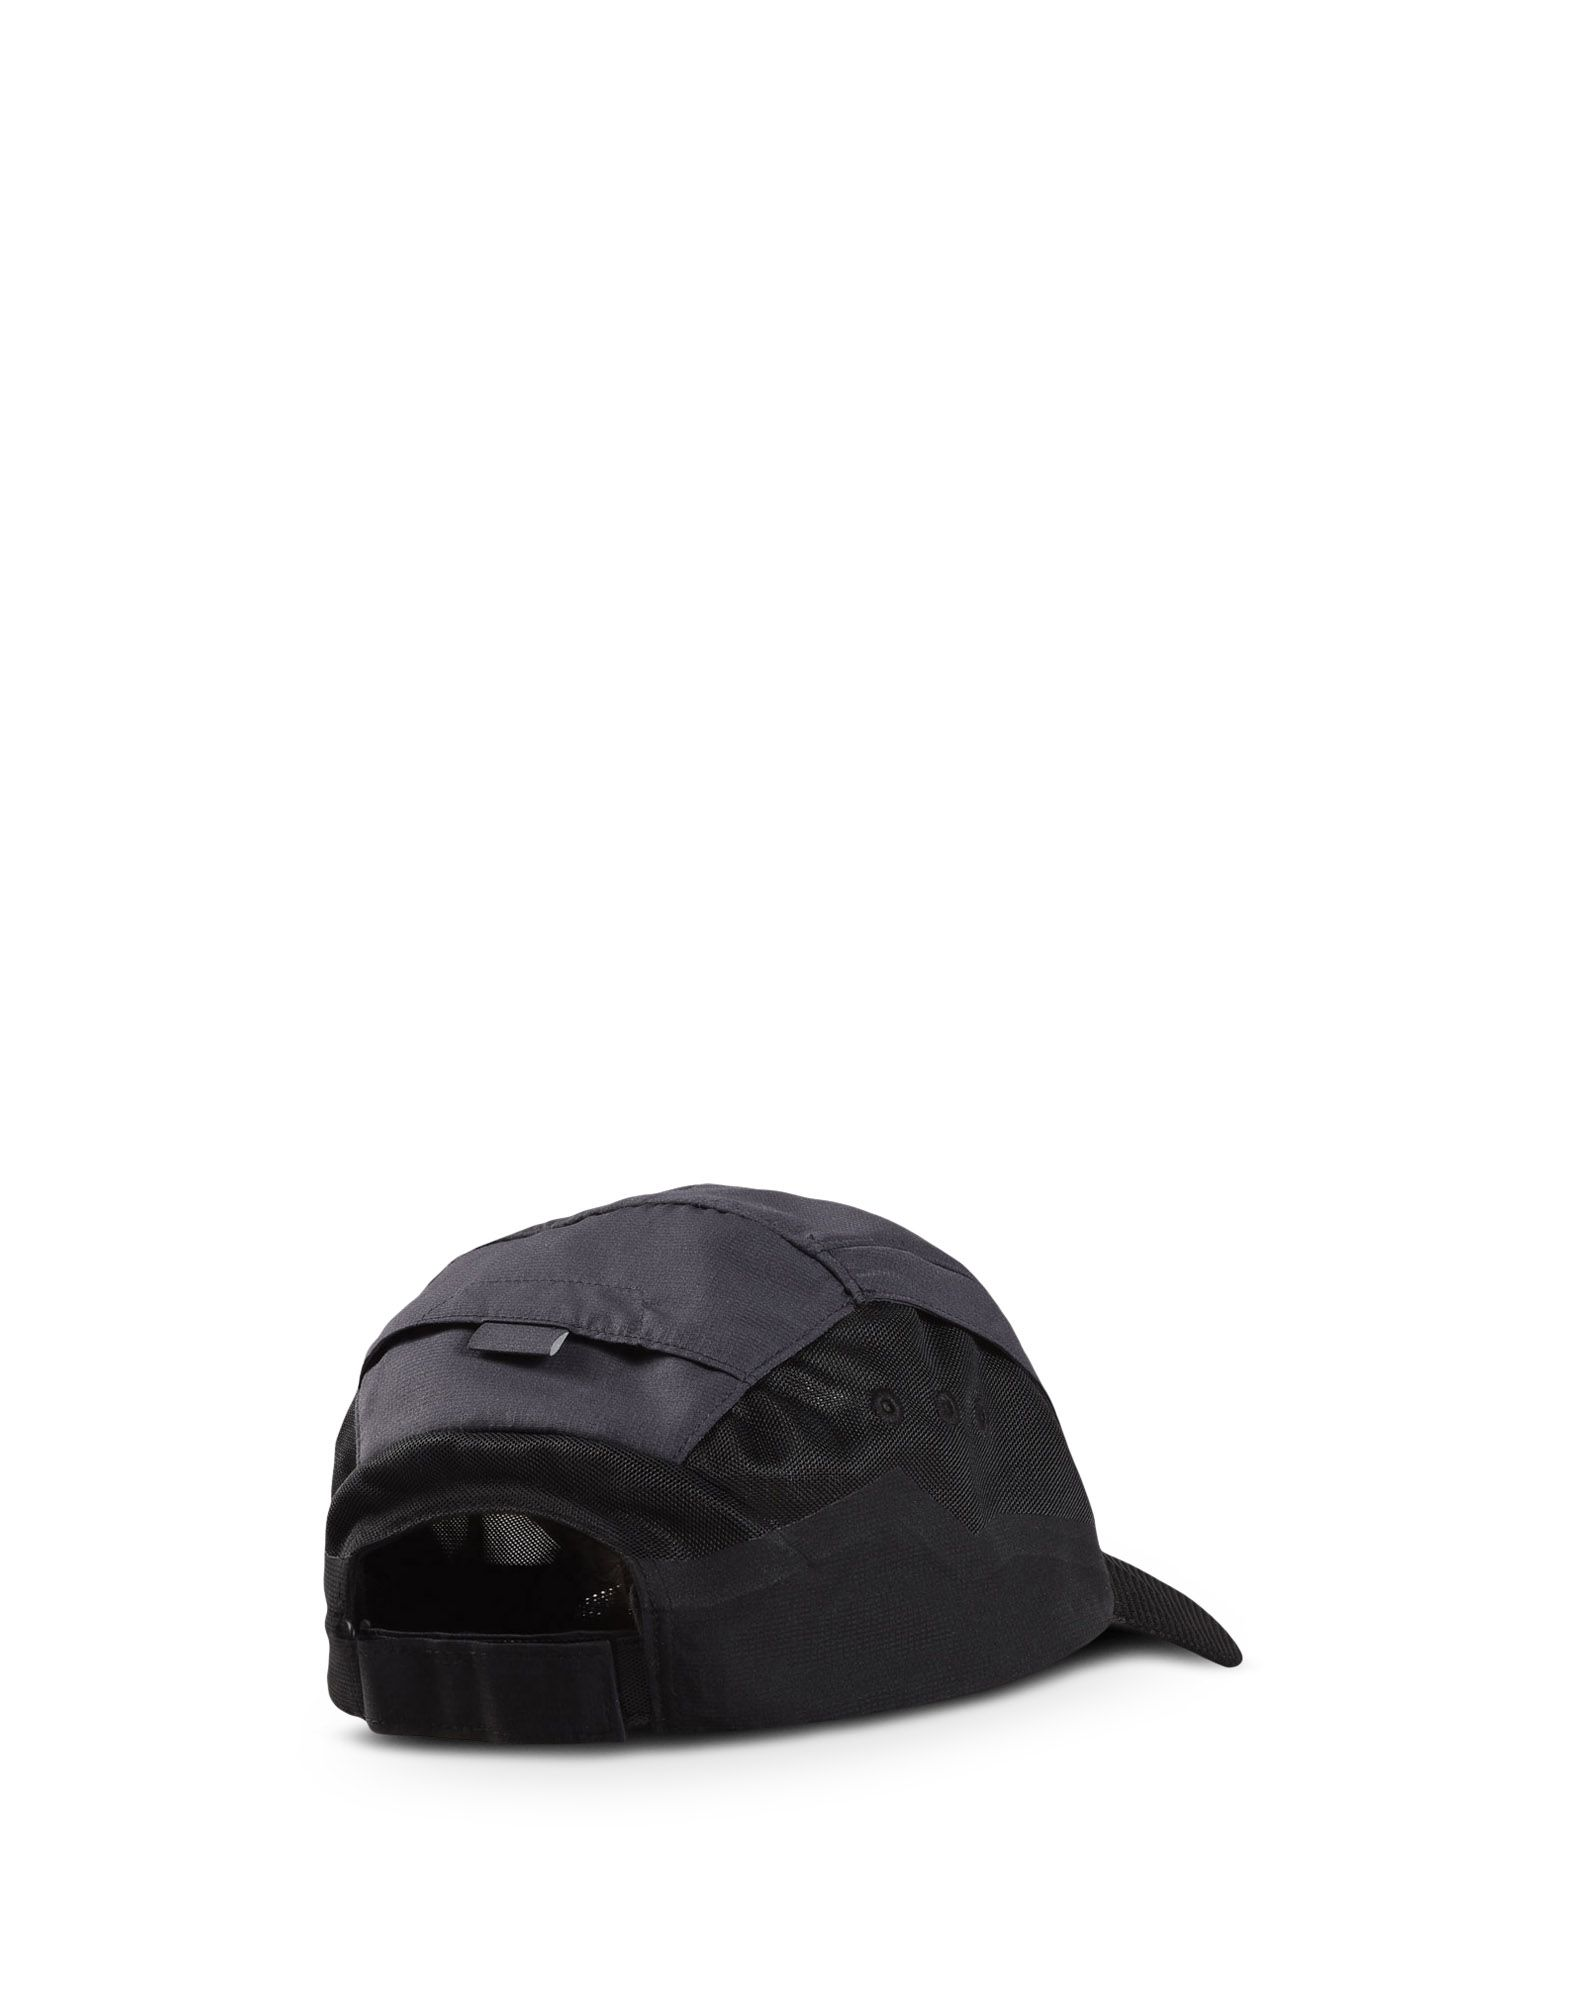 Y-3 RUN BLACK CAP OTHER ACCESSORIES unisex Y-3 adidas